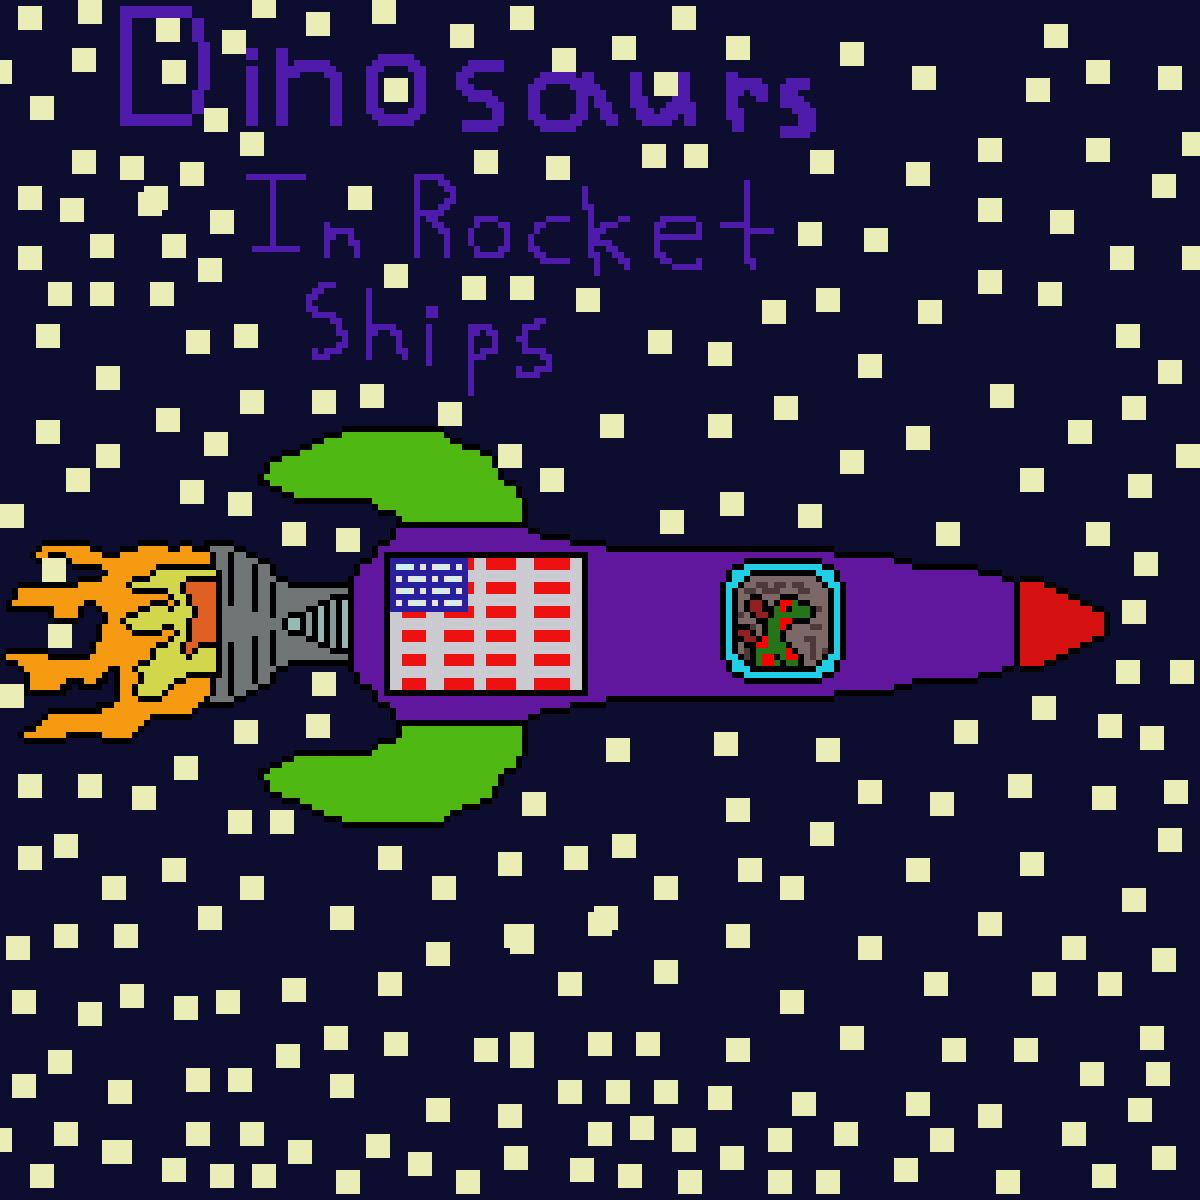 main-image-A stegosaurus in a rocket ship: (Dinosaurs in rocket sh  by GoldH2O